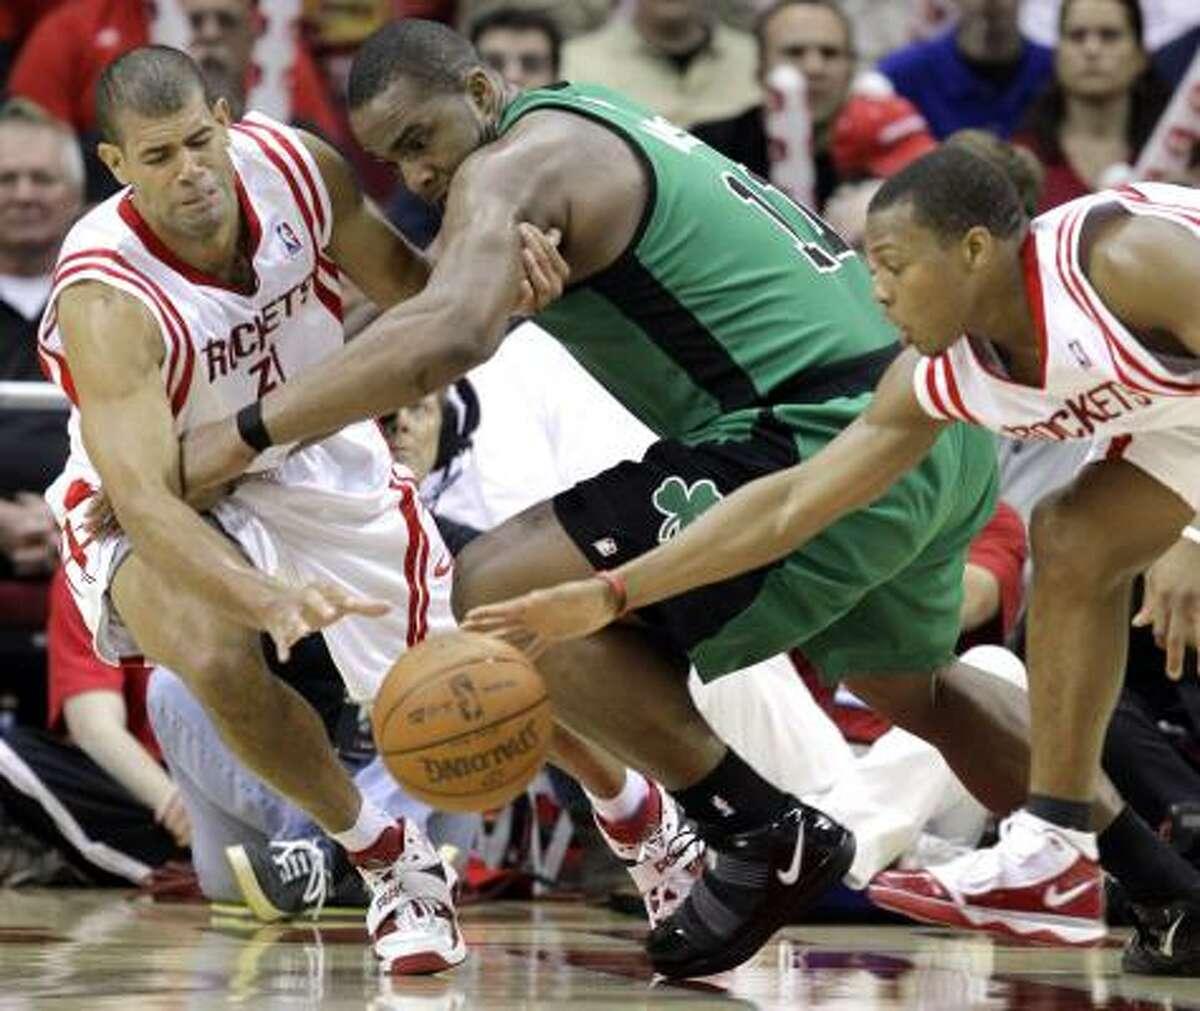 Rockets forward Shane Battier (31) and guard Kyle Lowry (7) battle Celtics forward Glen Davis (11) for a loose ball during the fourth quarter.